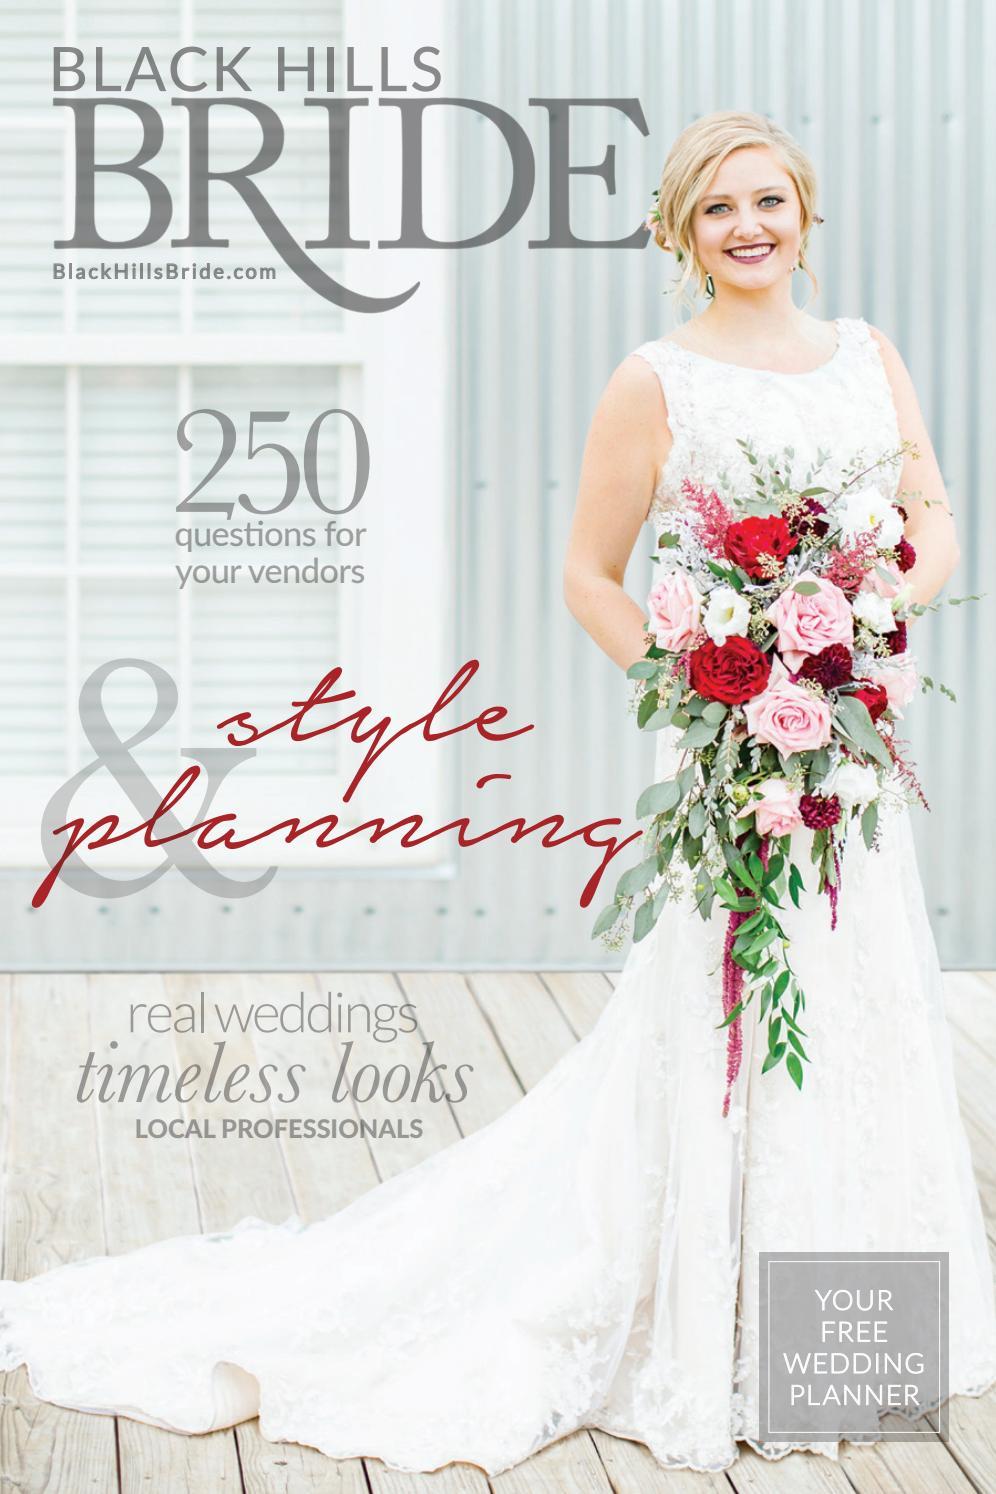 9c5e06f4af 2018 Black Hills Bride by Evergreen Media - issuu